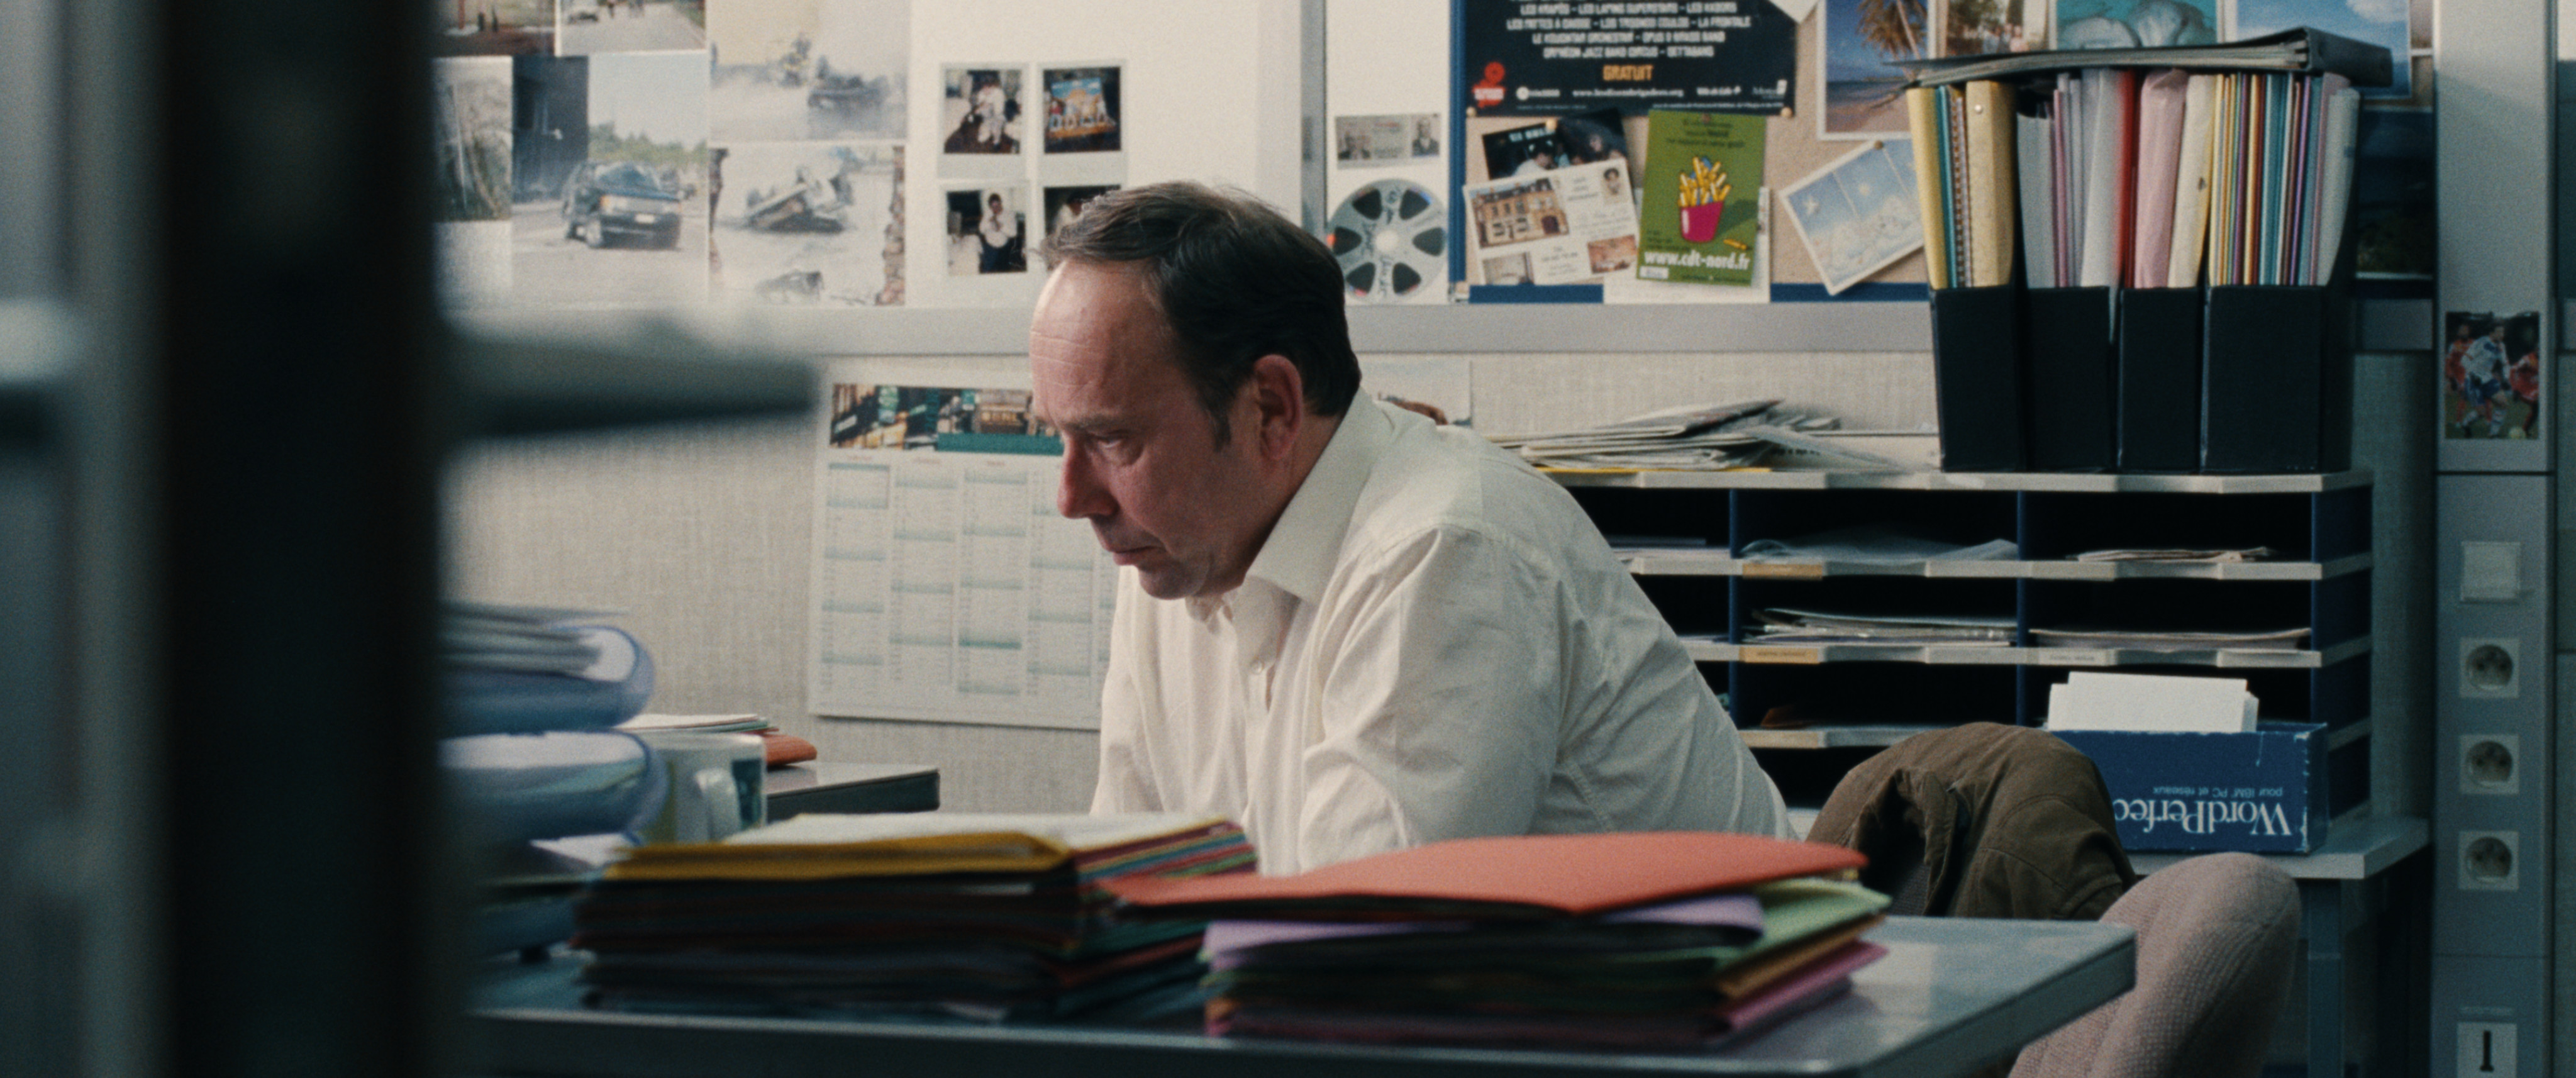 Terre battue: Olivier Gourmet in una scena del film di Stéphane Demoustier